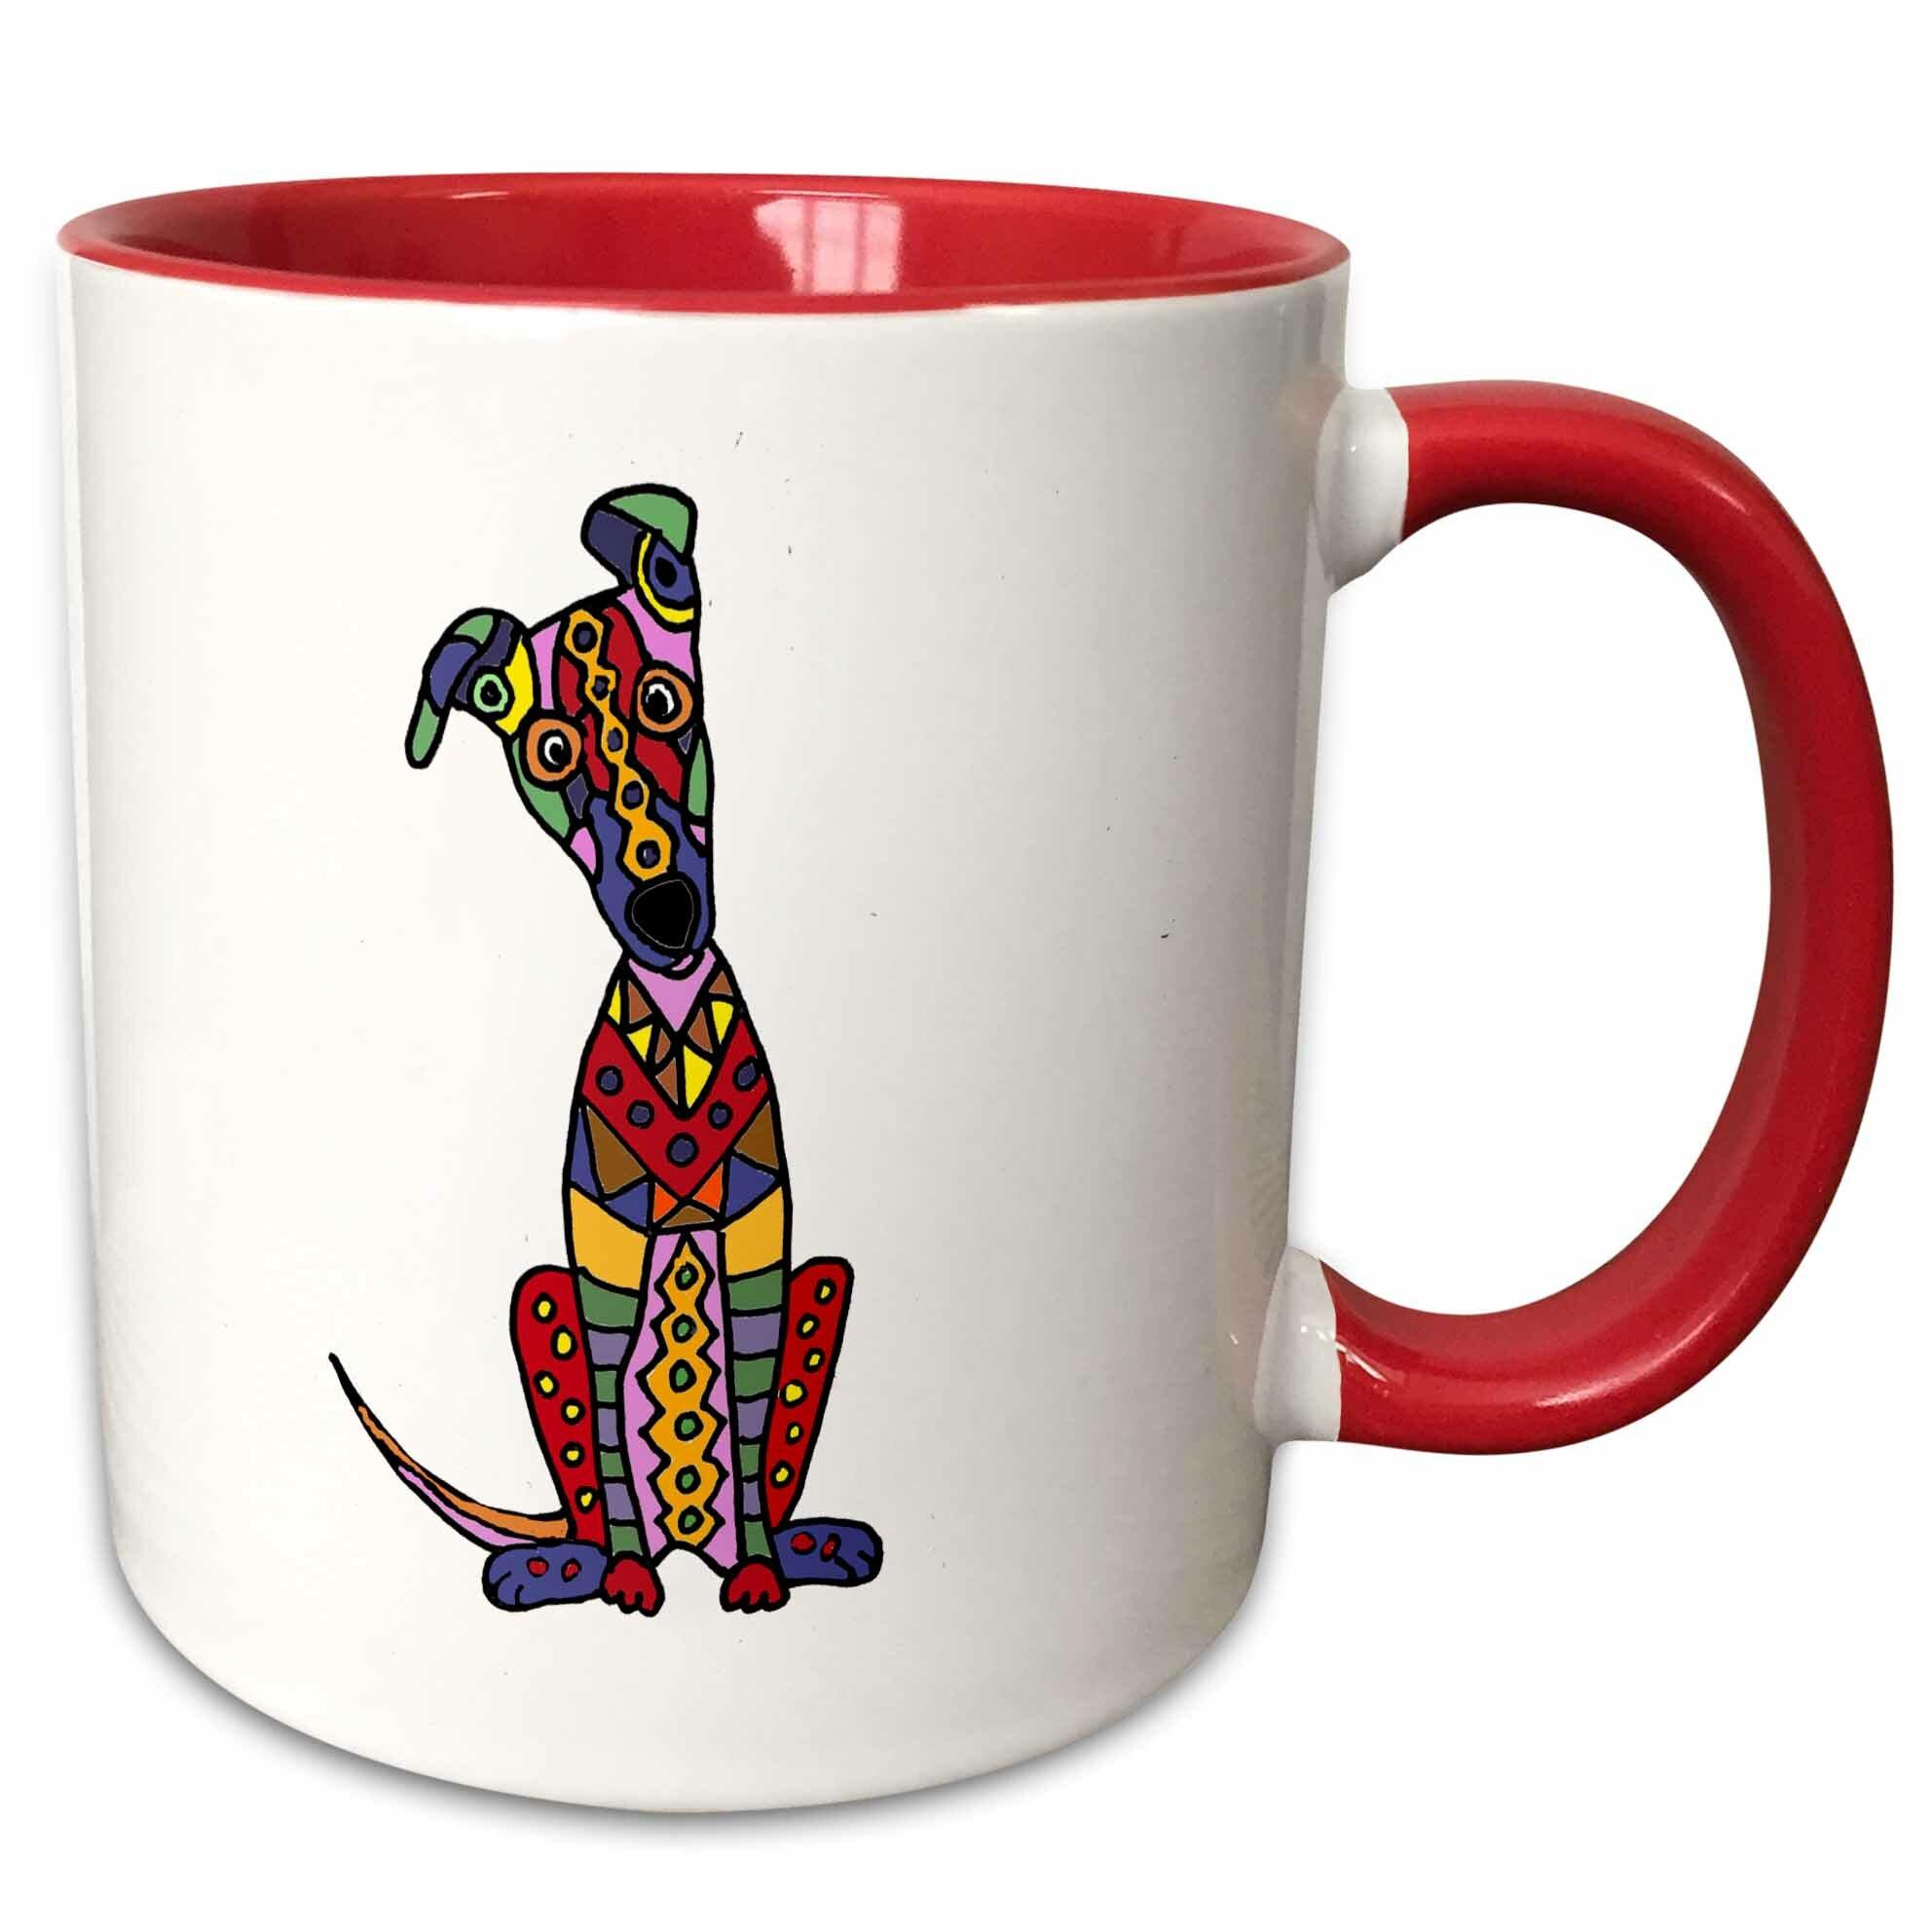 Symple Stuff Folse Funny Cute Artistic Greyhound Dog Abstract Art Coffee Mug Wayfair